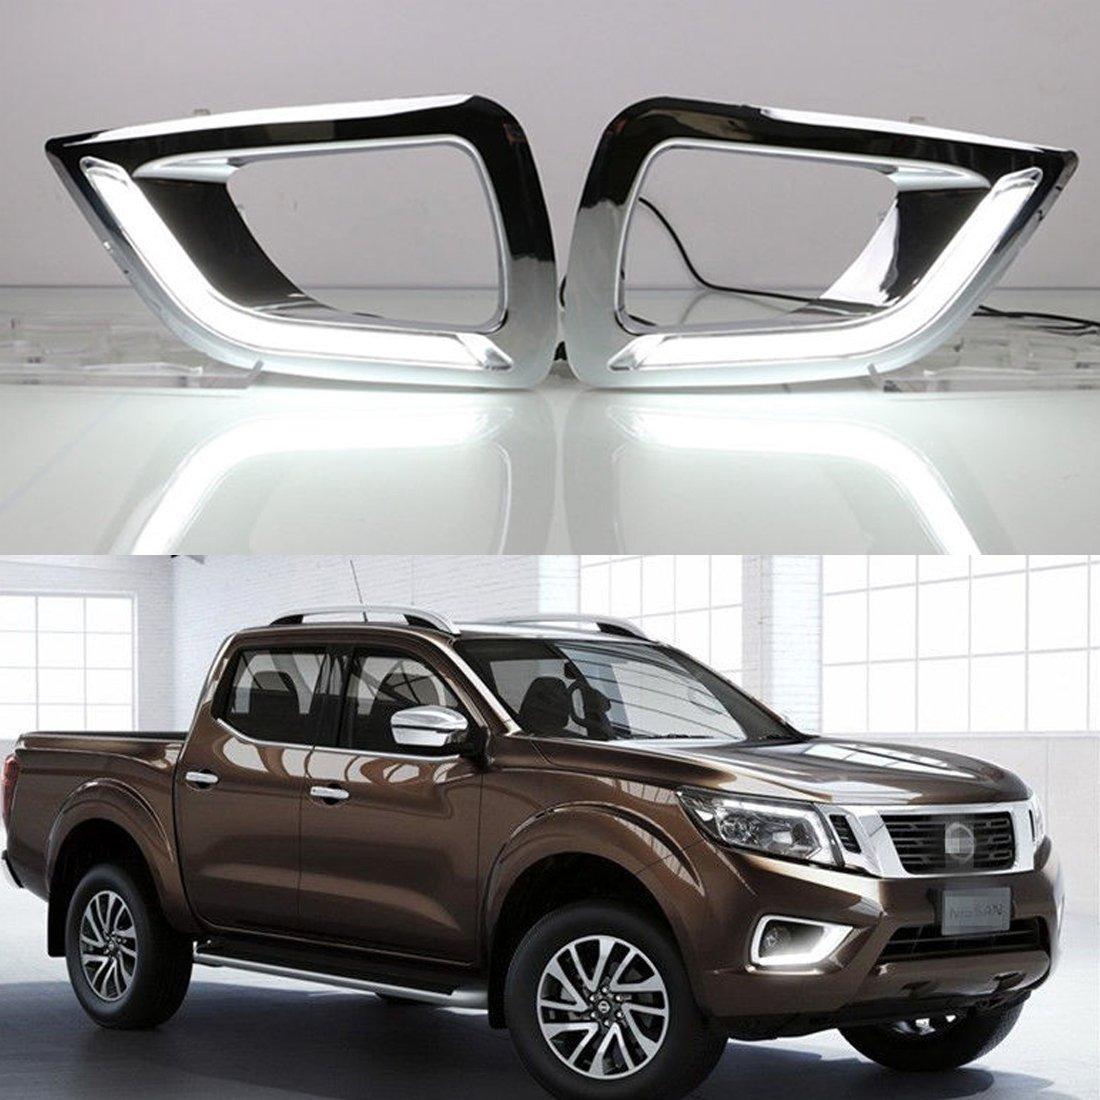 Head Lights Lamp For Fit Nissan D40 Navara Pickup UTE 2005-2013 Left Hand Side